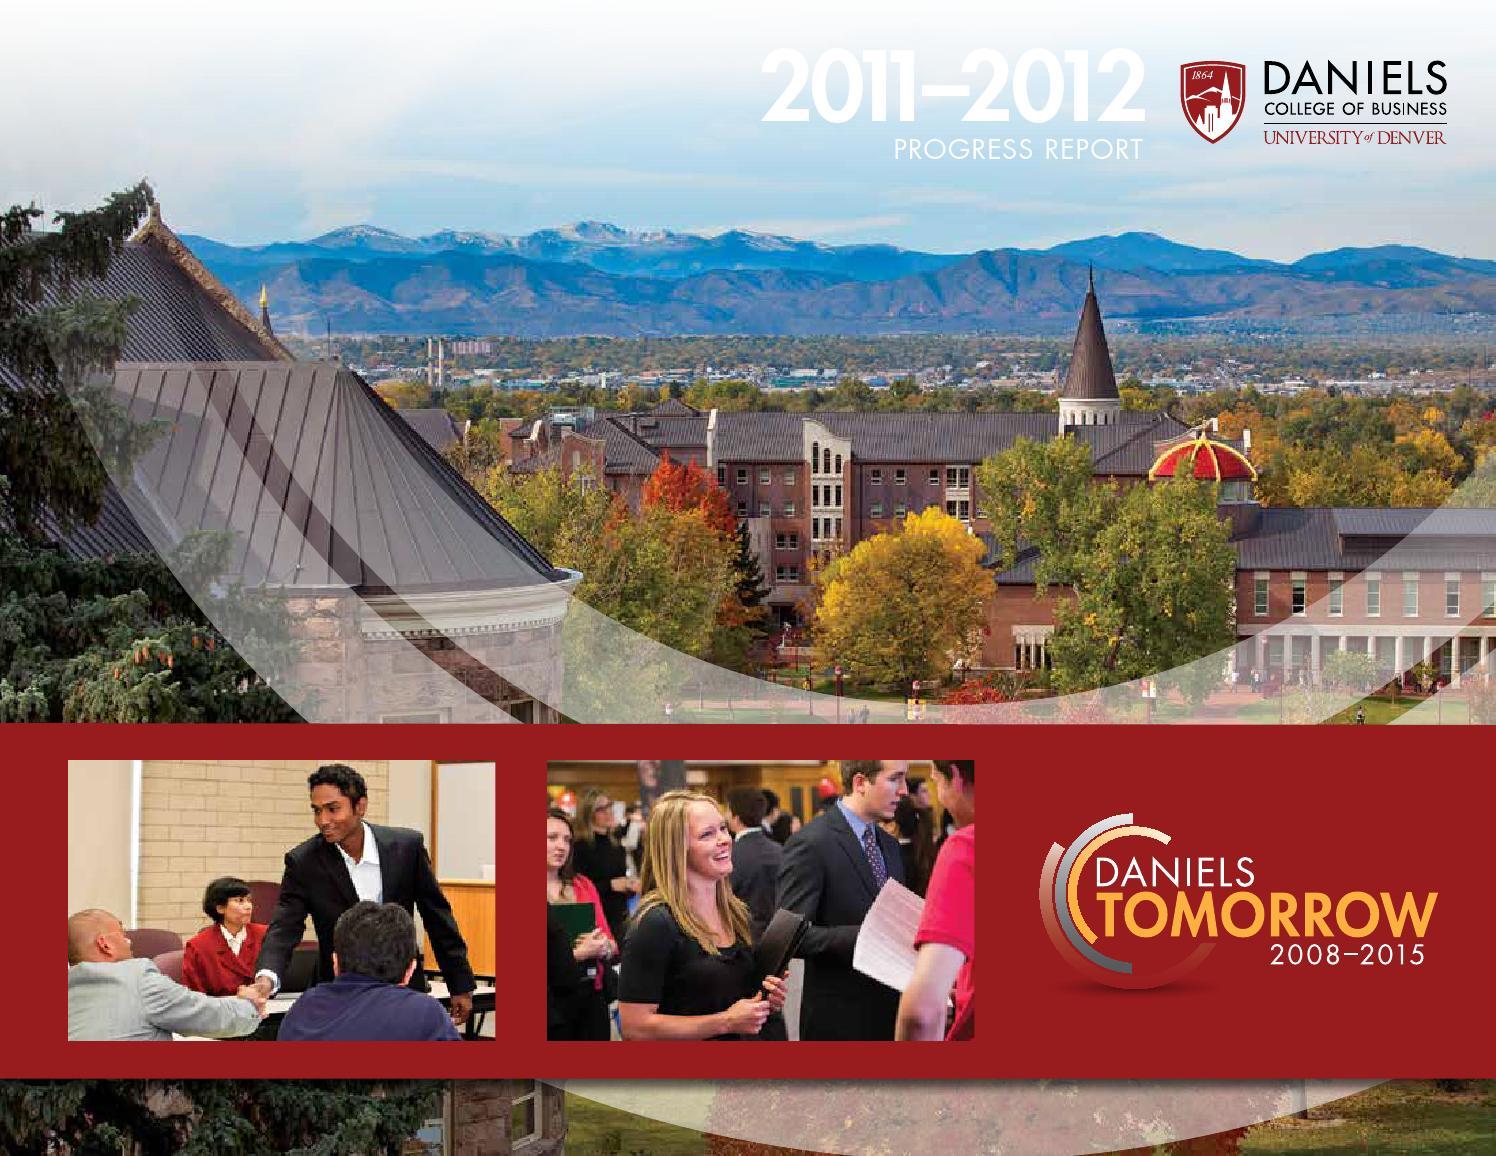 daniels tomorrow progress report by daniels college of daniels tomorrow progress report 2011 2012 by daniels college of business issuu